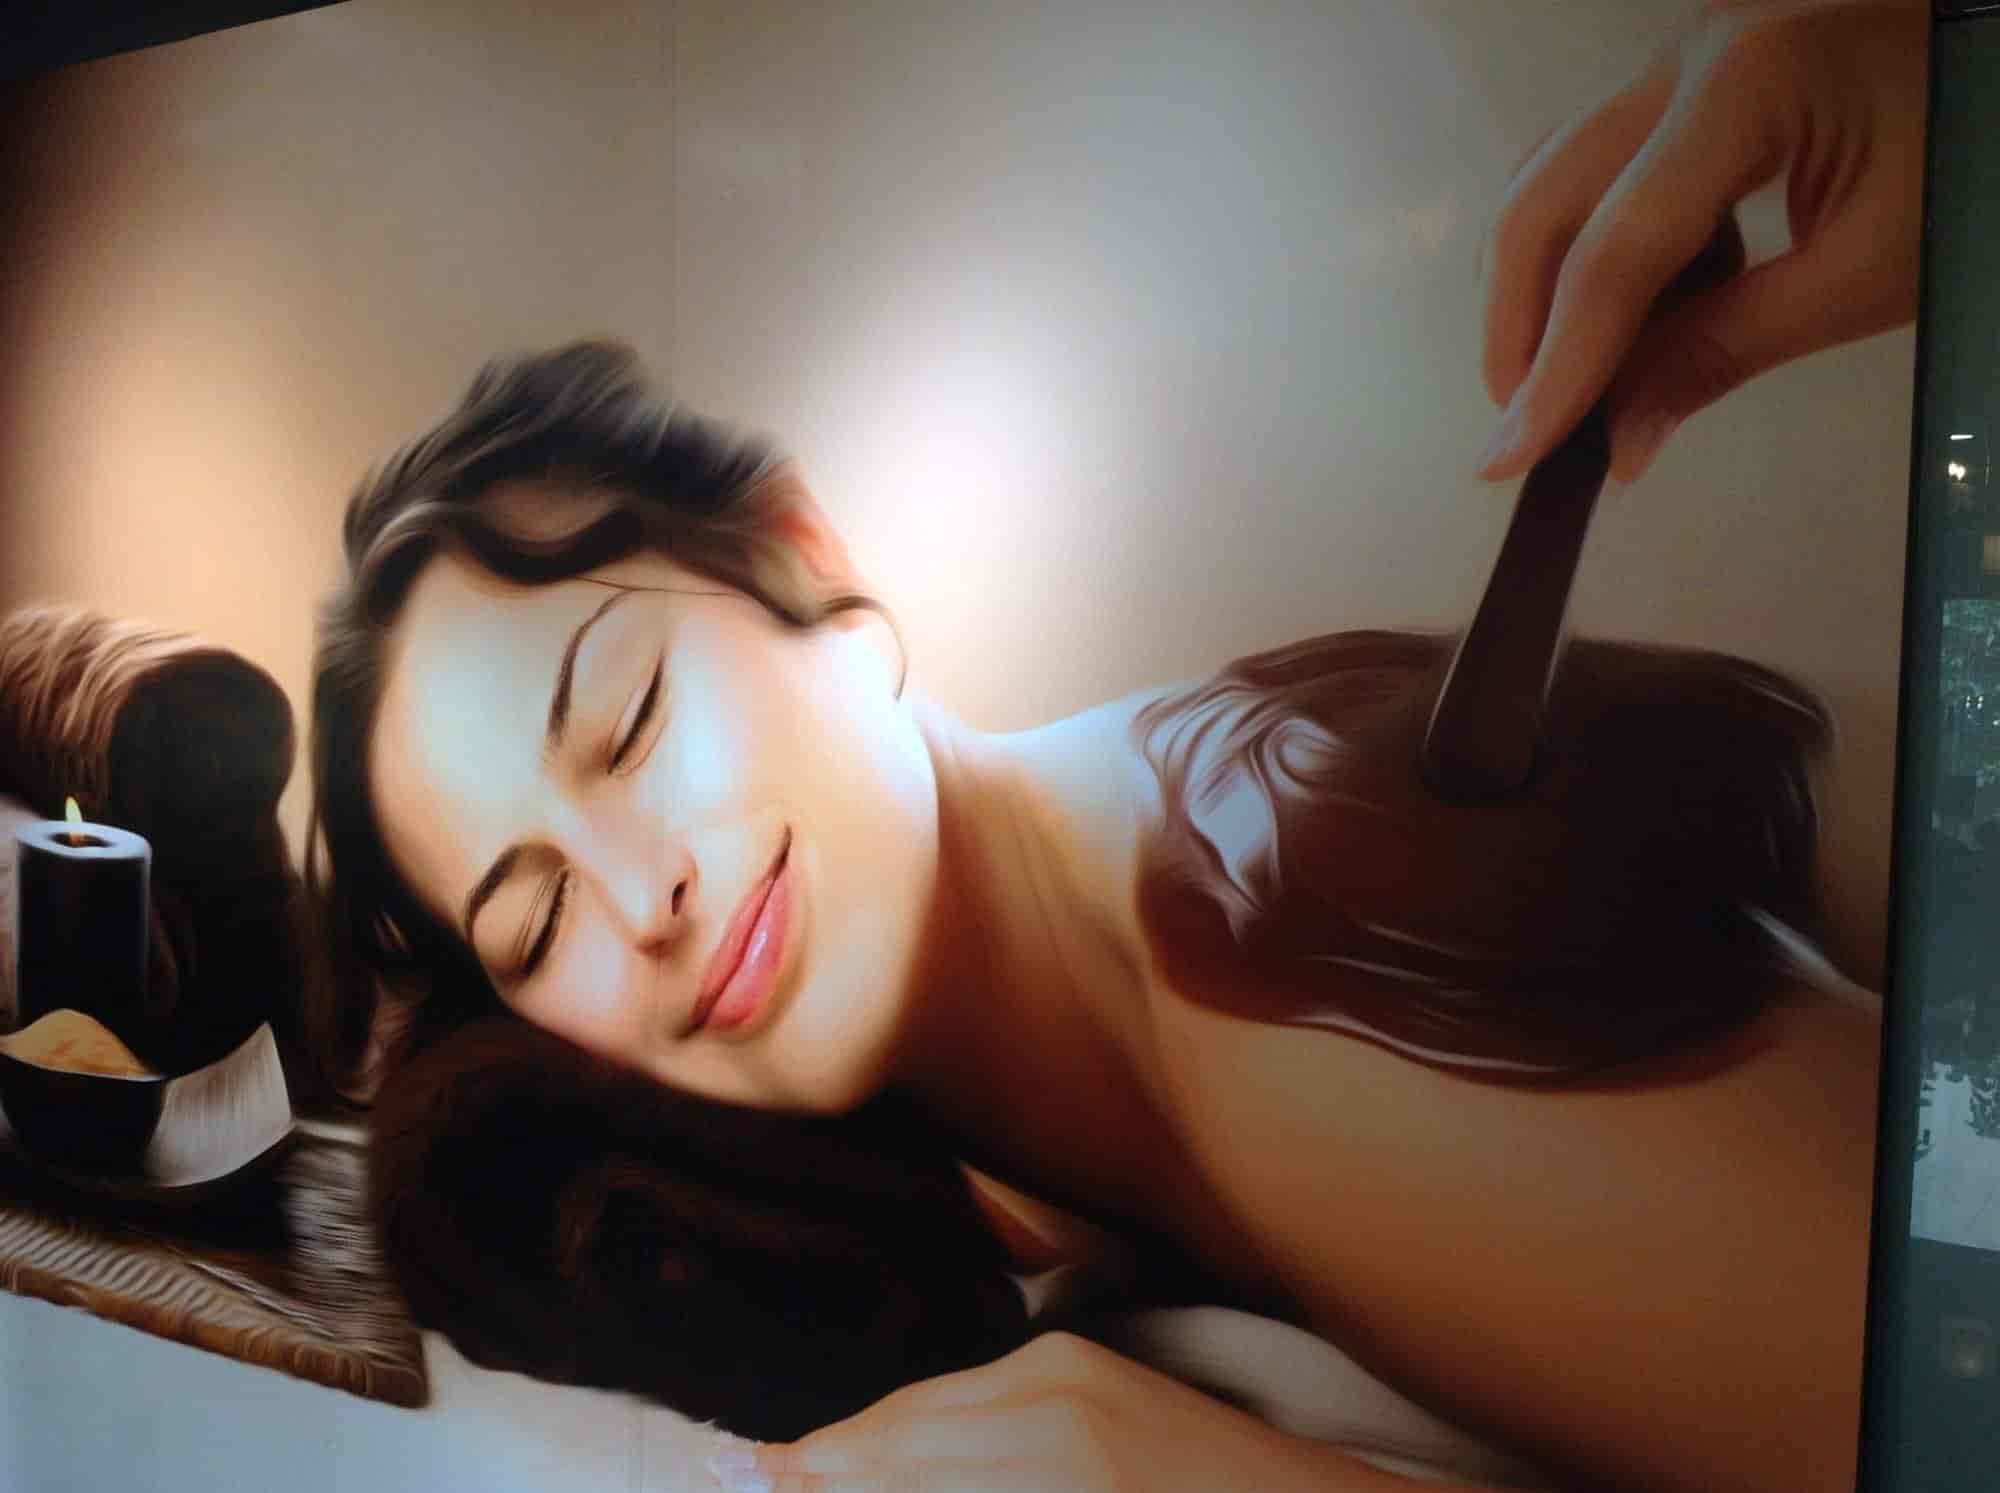 citrus salon spa photos, yelahanka, bangalore- pictures & images